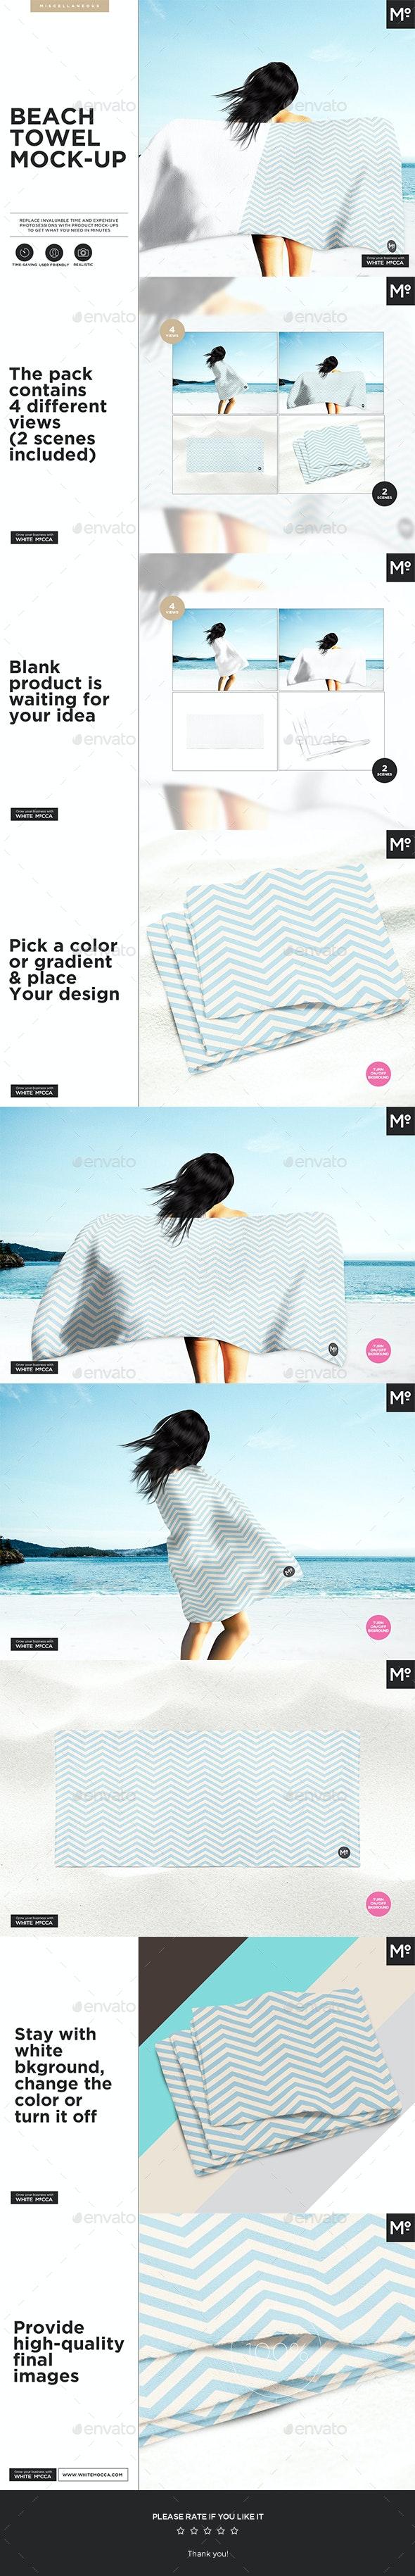 Beach Towel Mock-up - Miscellaneous Product Mock-Ups